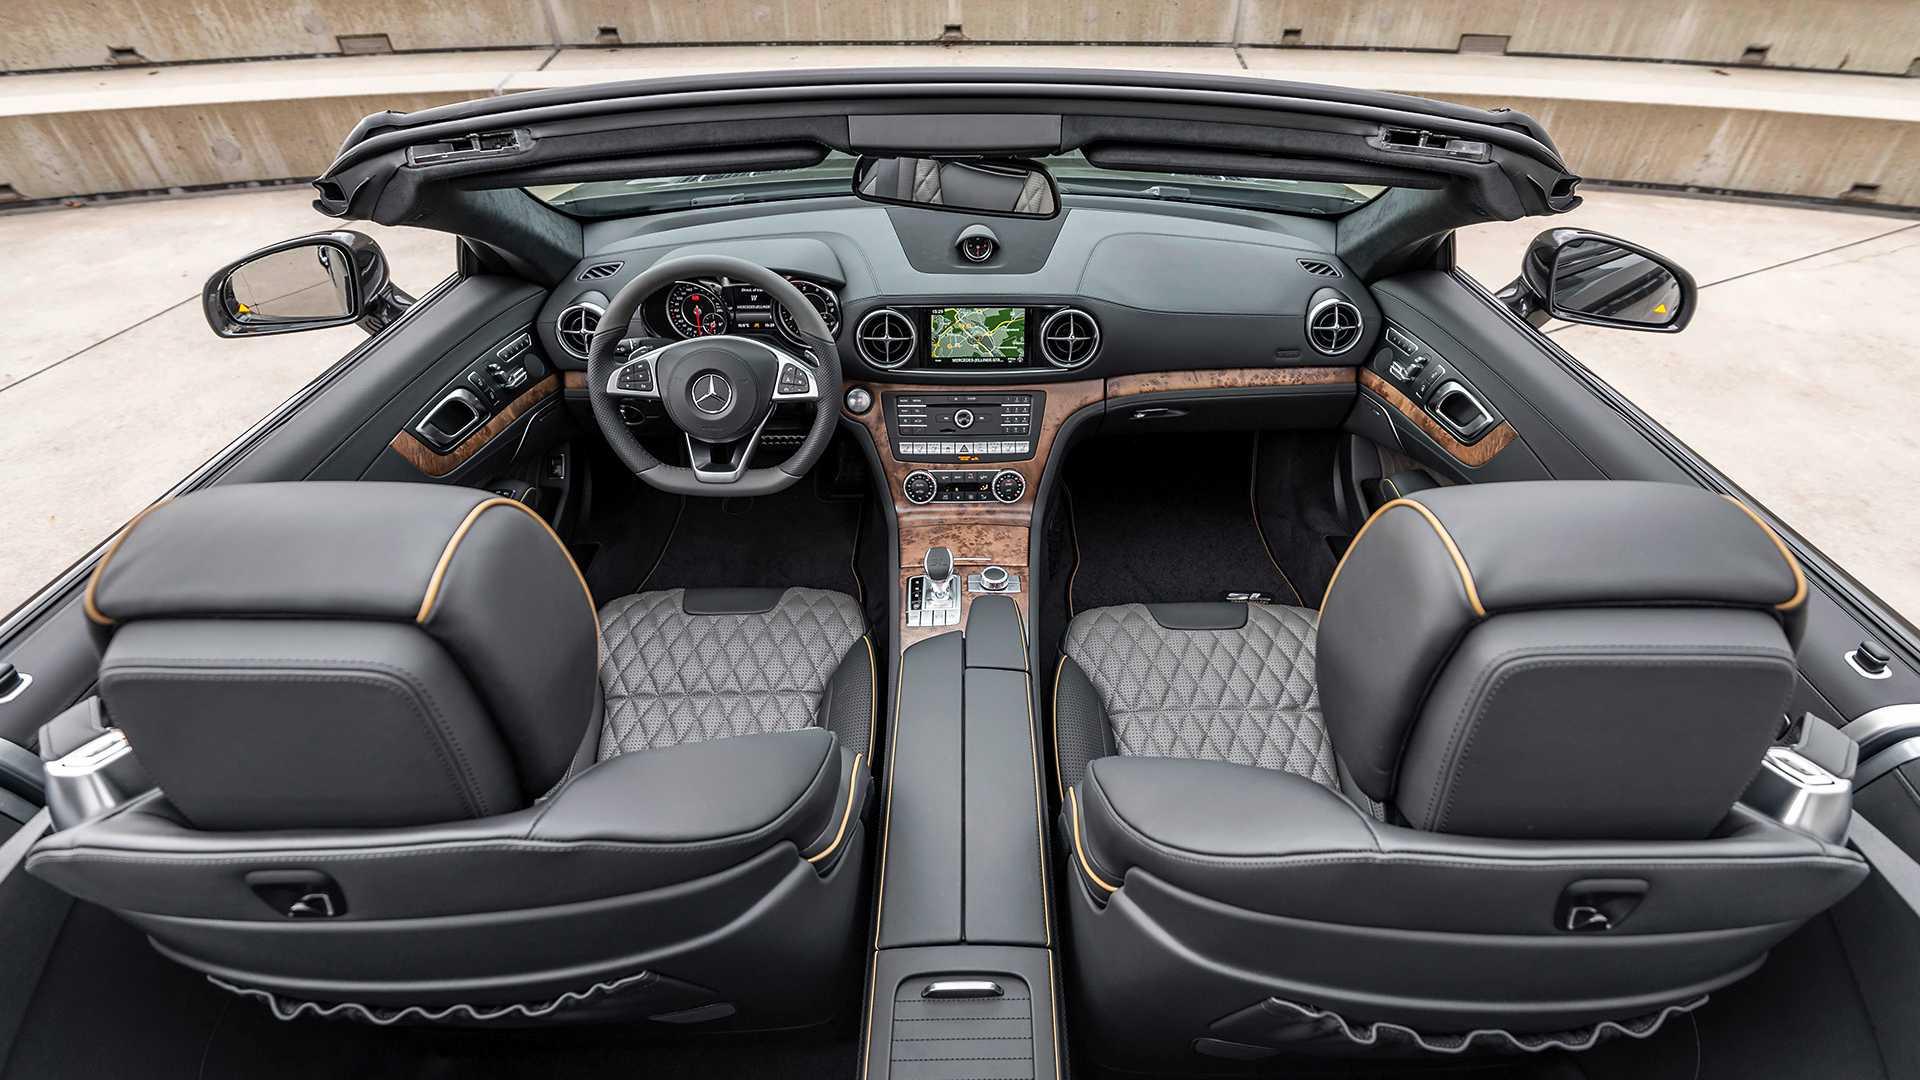 2020 Mercedes-Benz SL 500 Grand Edition (Color: Graphite Grey) Interior Cockpit Wallpapers (11)